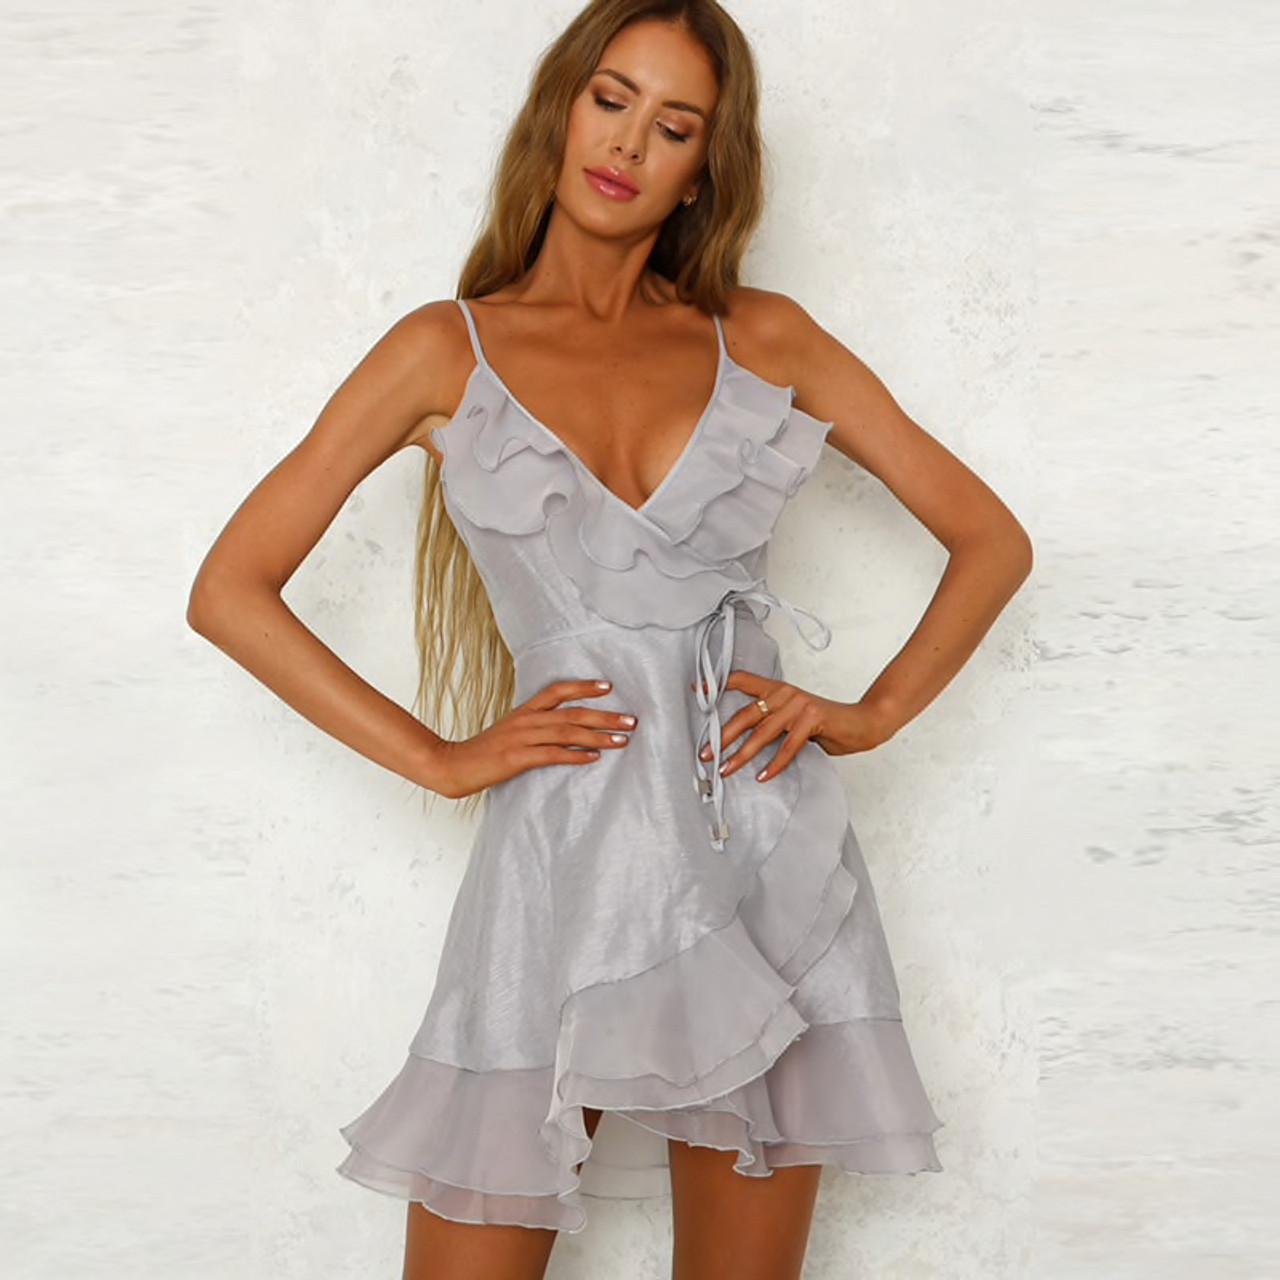 0432e1a664f Woman-Beach-Summer-Dress-2018-Elegant-Ruffle-Organza-Dress-Women-V-Neck- Sleeveless-Spaghetti-Strap-Casual  60911.1551151540.jpg c 2 imbypass on